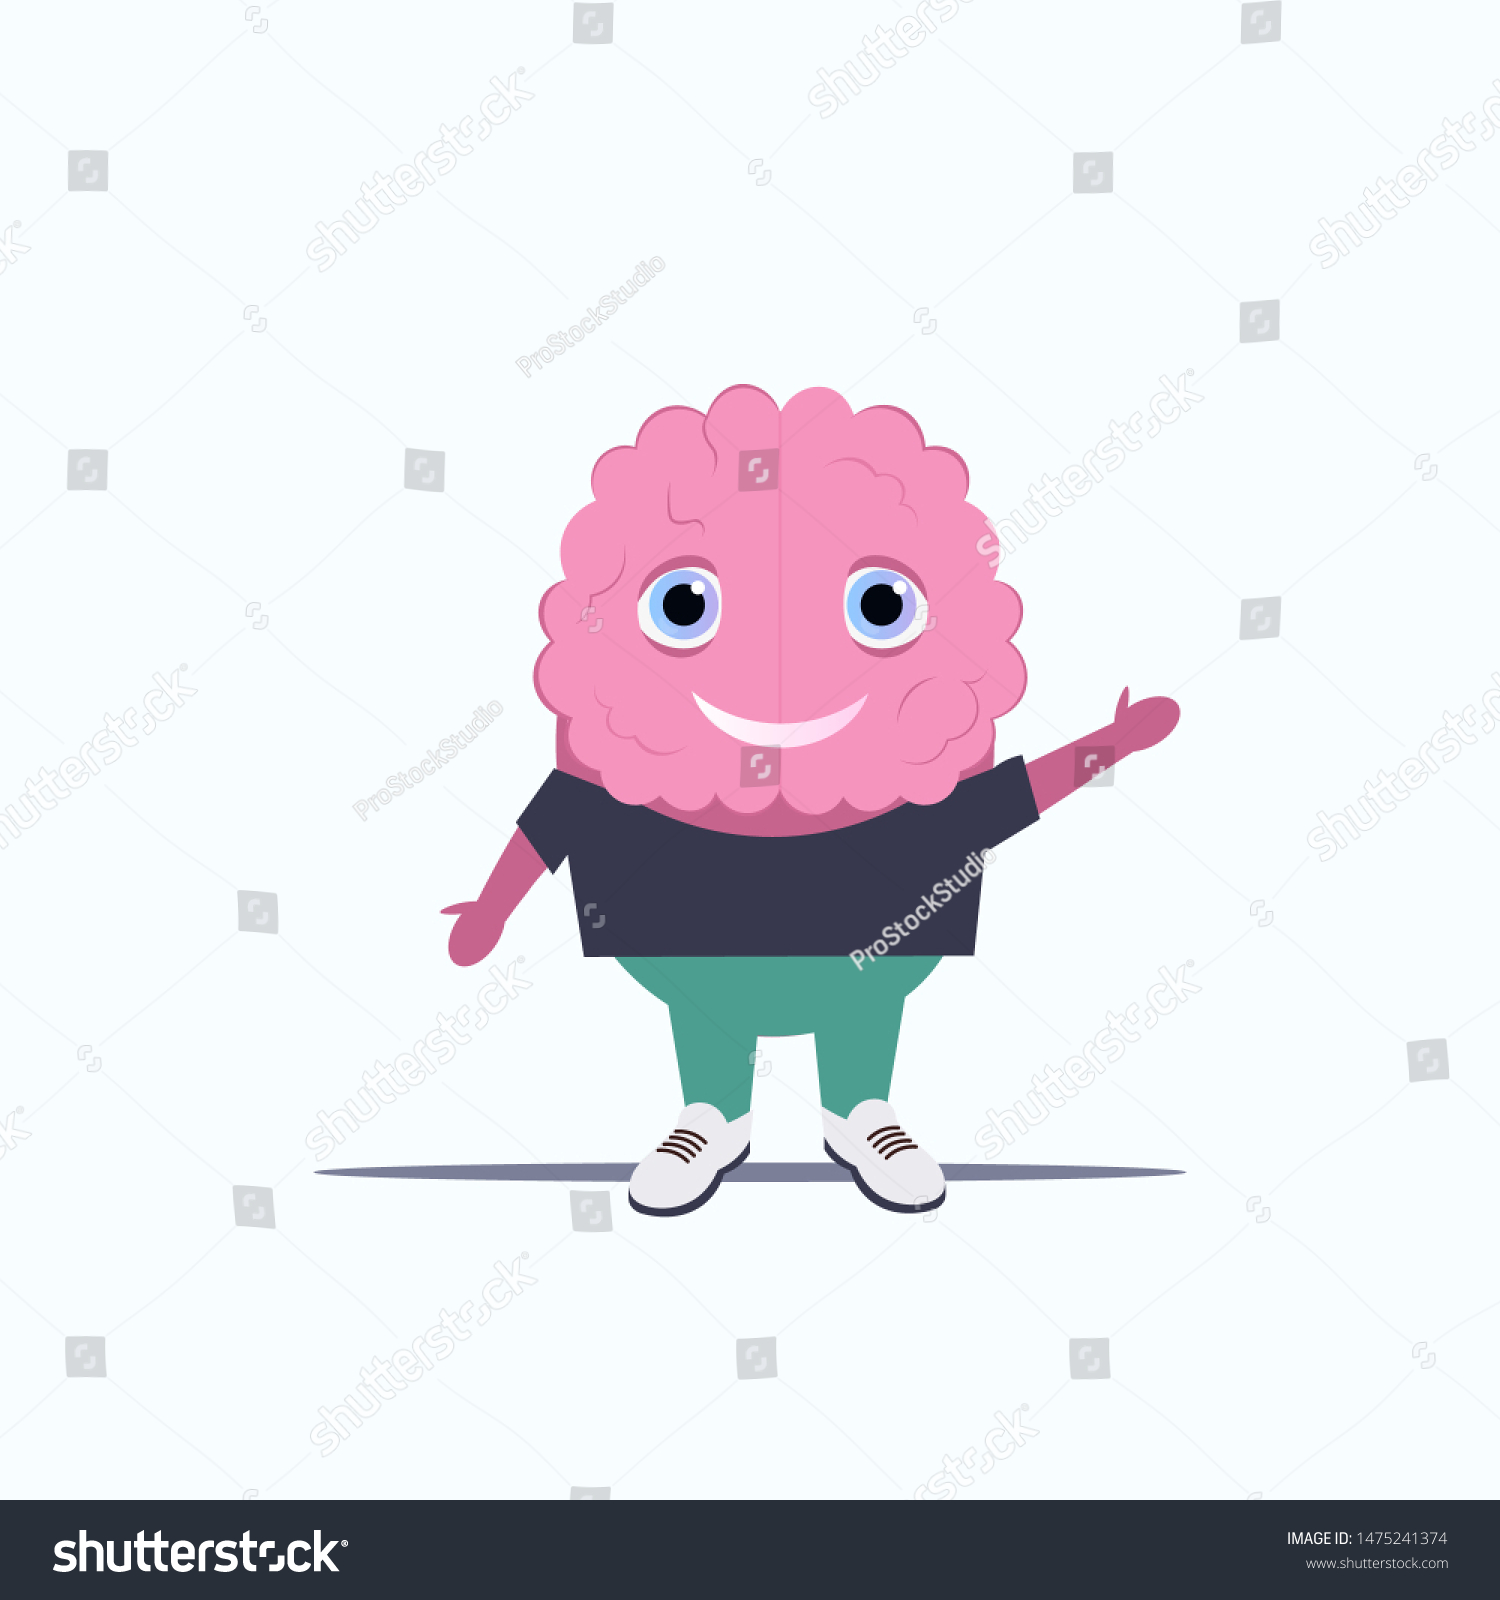 Human Brain Pink Cartoon Character Standing Stock Vector Royalty Free 1475241374